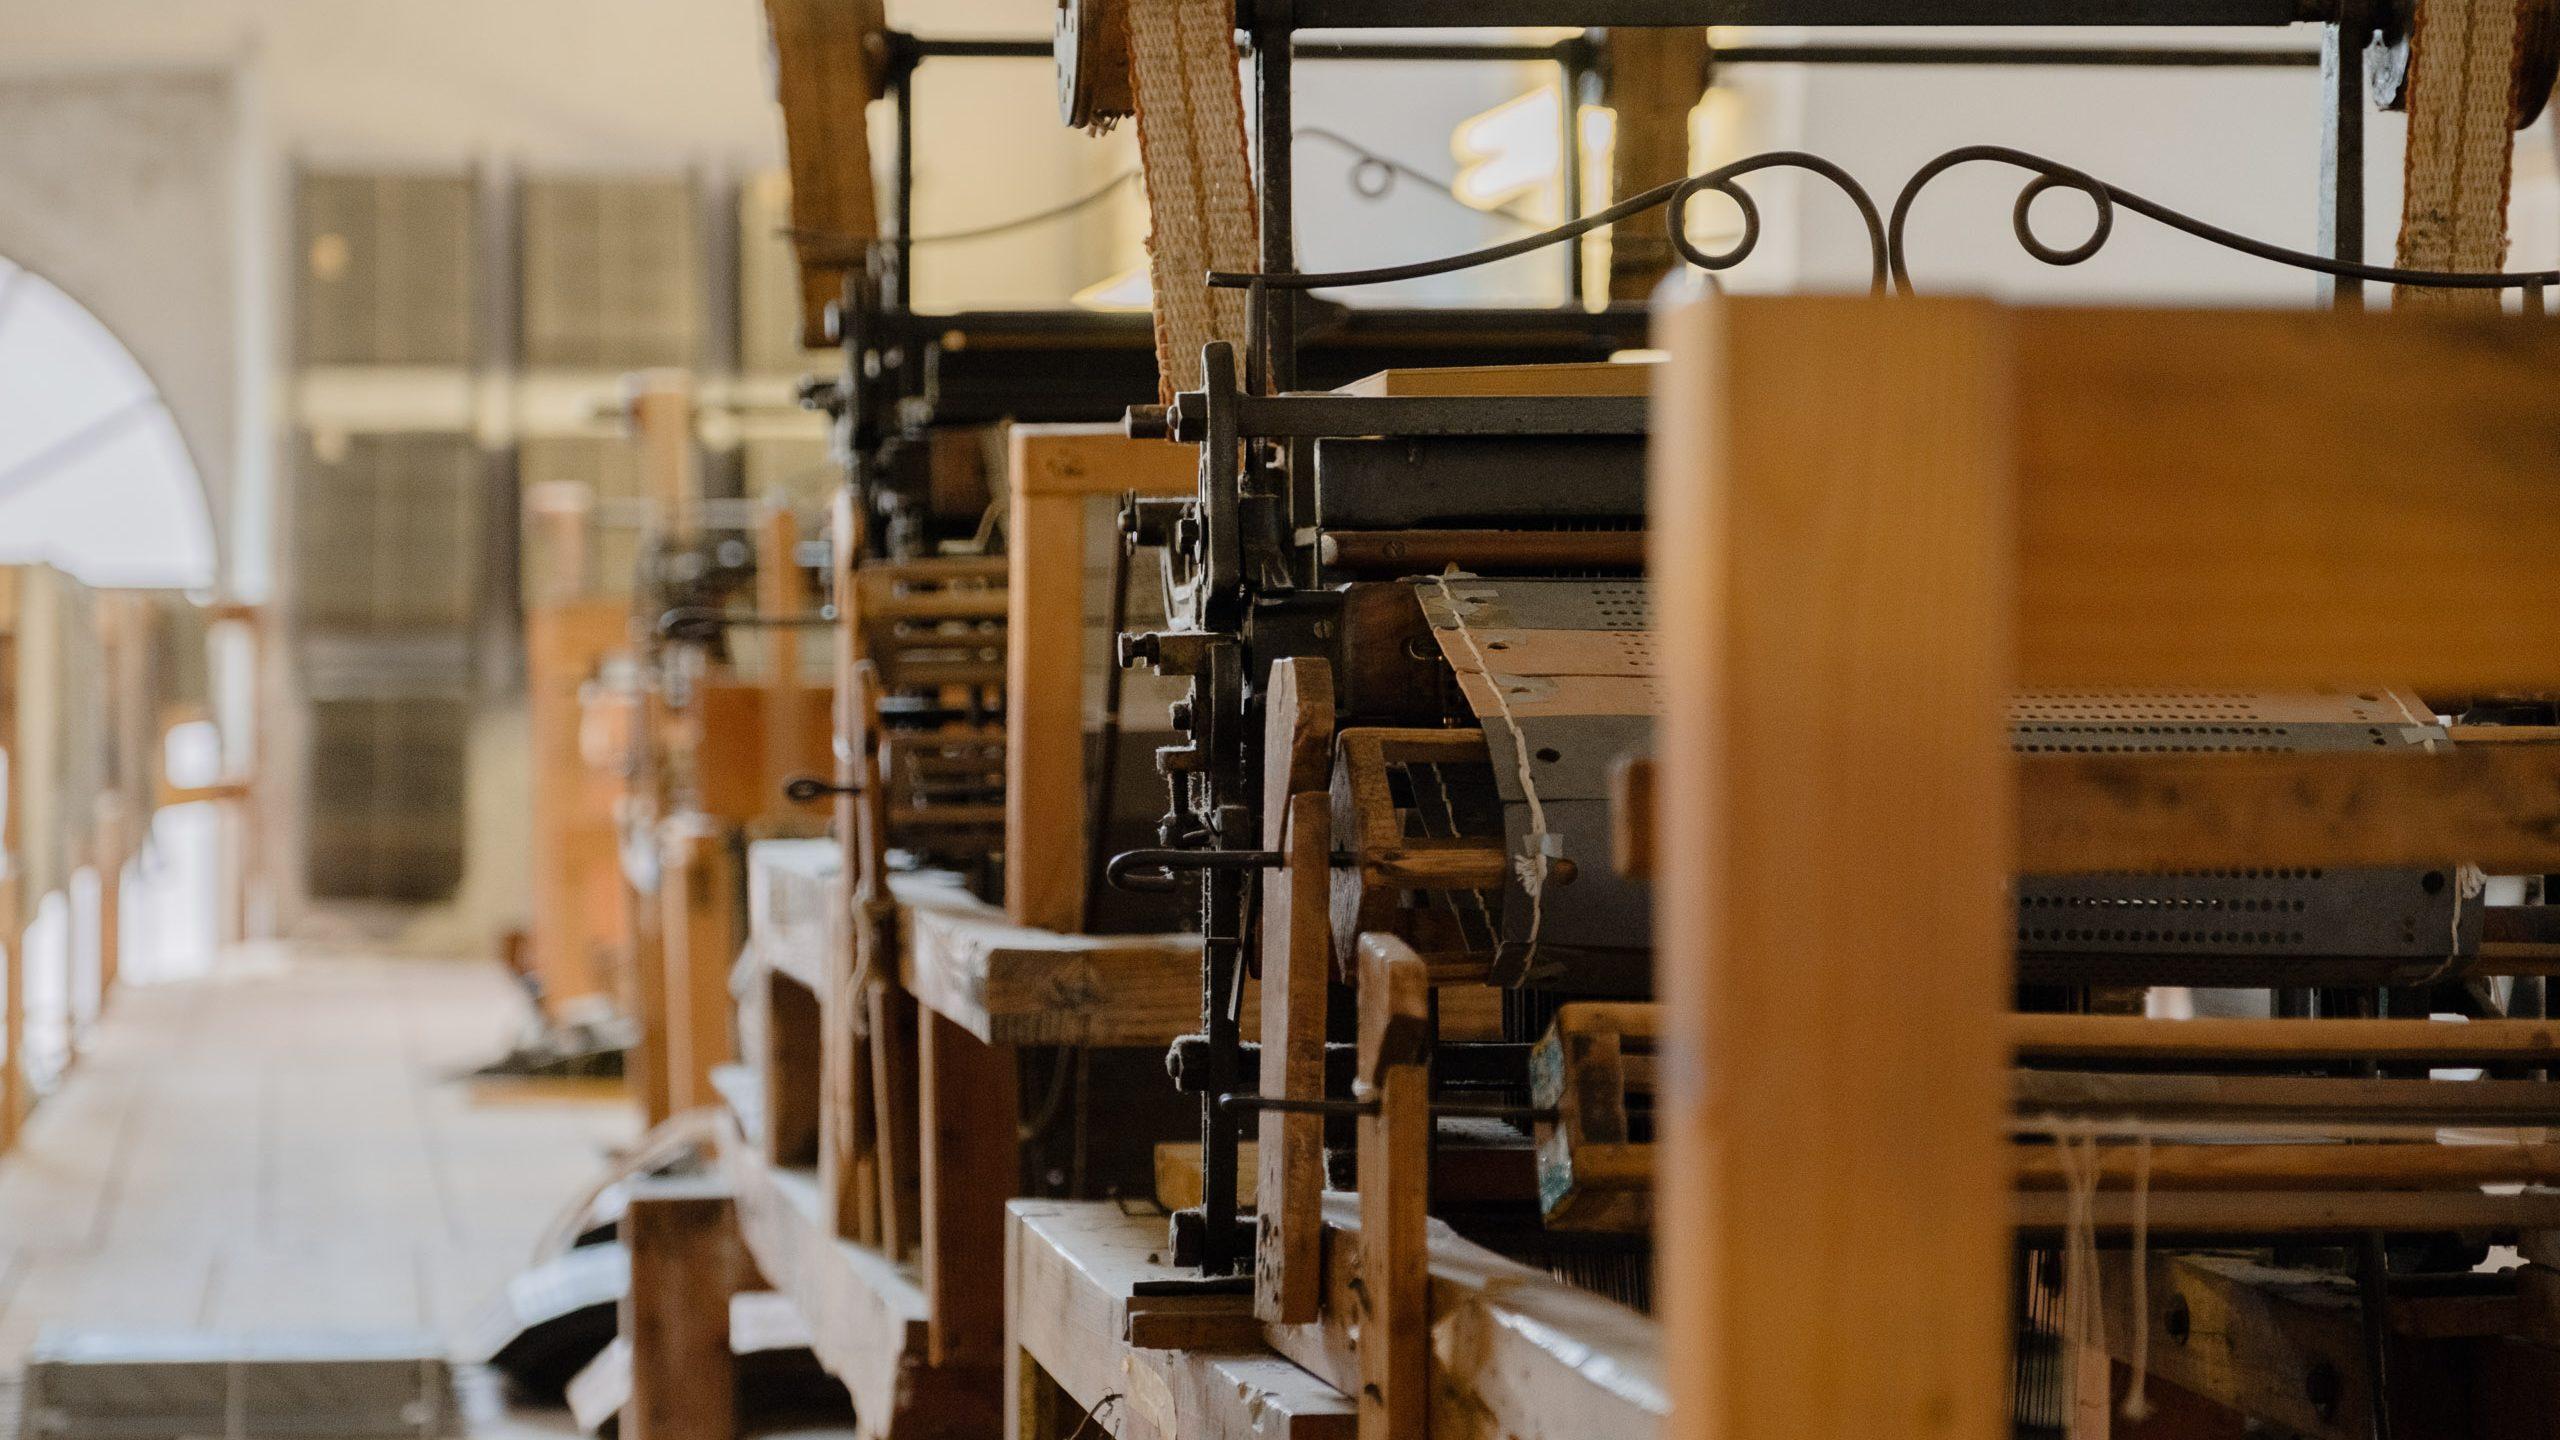 Artisan weaving workshop - Giuditta Brozzetti Museum Atelier  - Perugia, Umbria